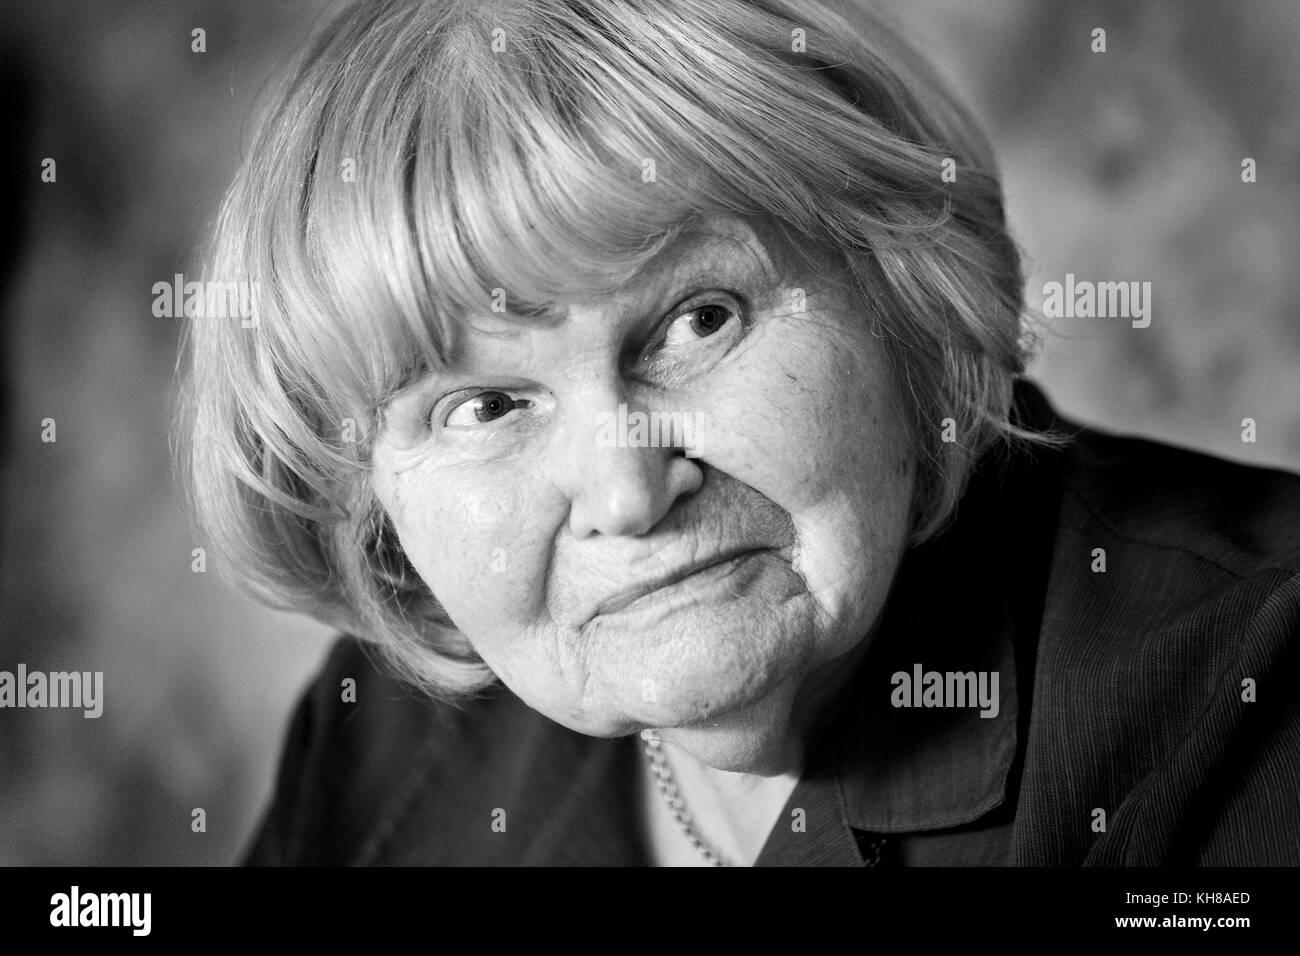 Photographer Jane Bown (13 March 1925 – 21 December 2014), B&W portrait - Stock Image